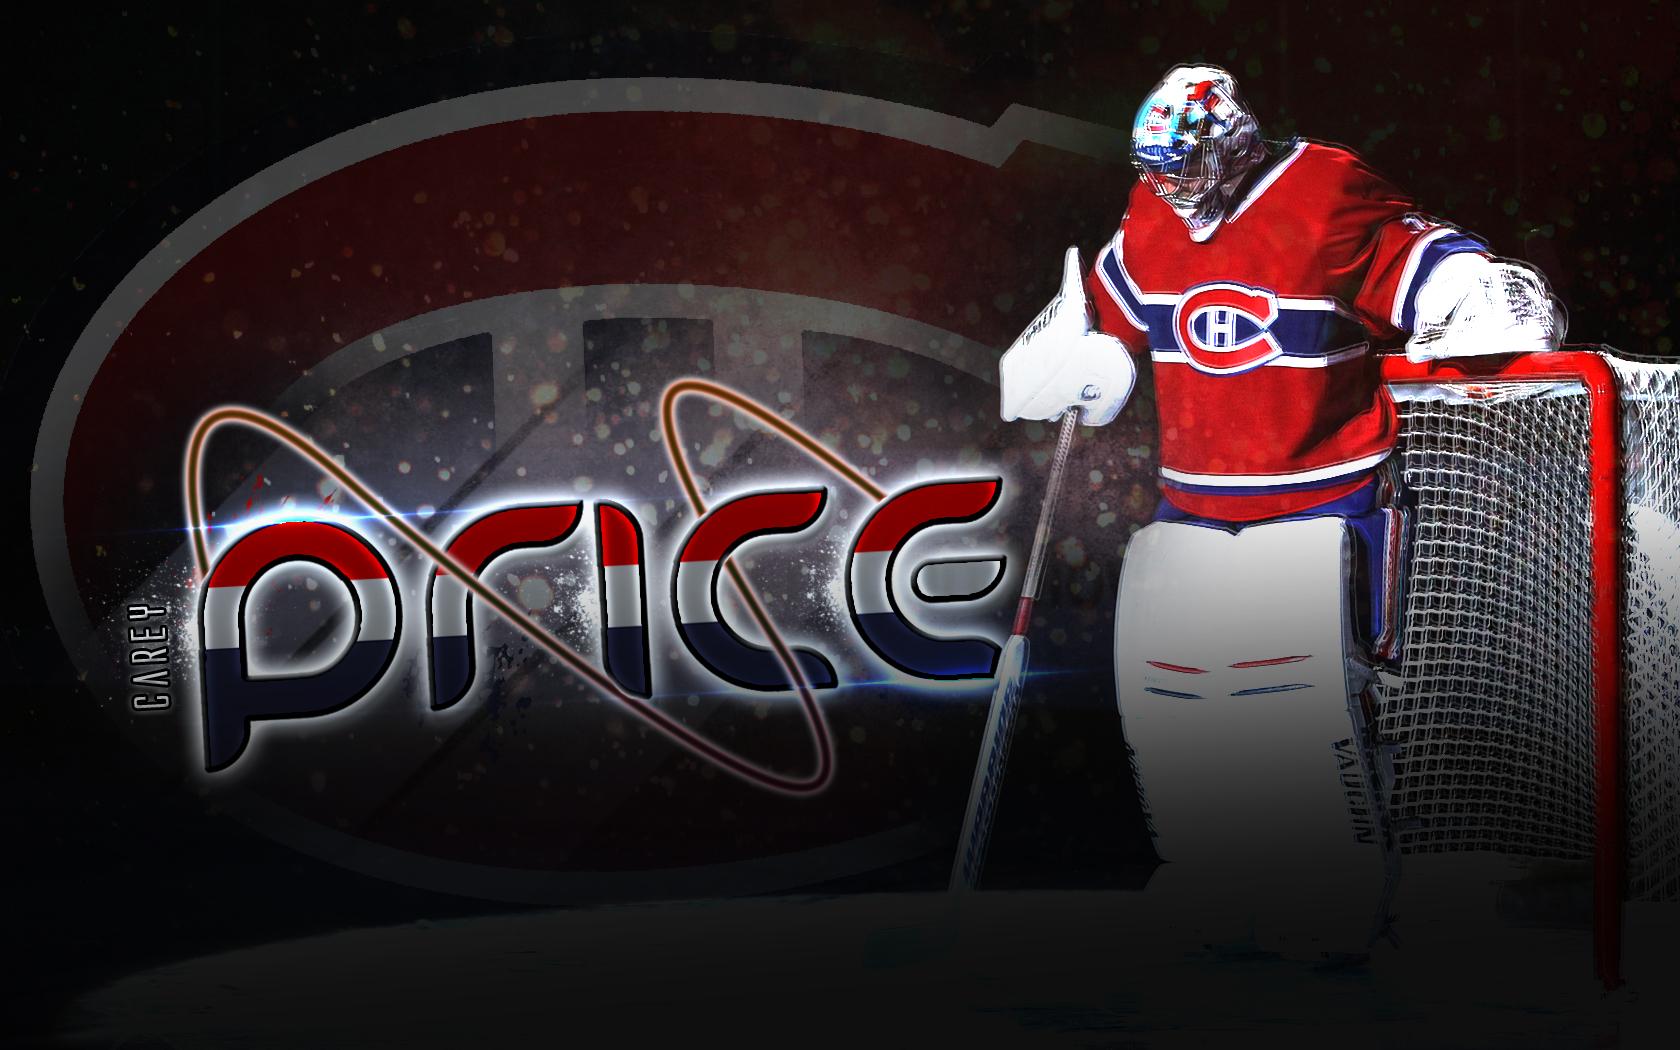 desktop wallpaper featuring Montreal Canadiens goaltender Carey Price 1680x1050